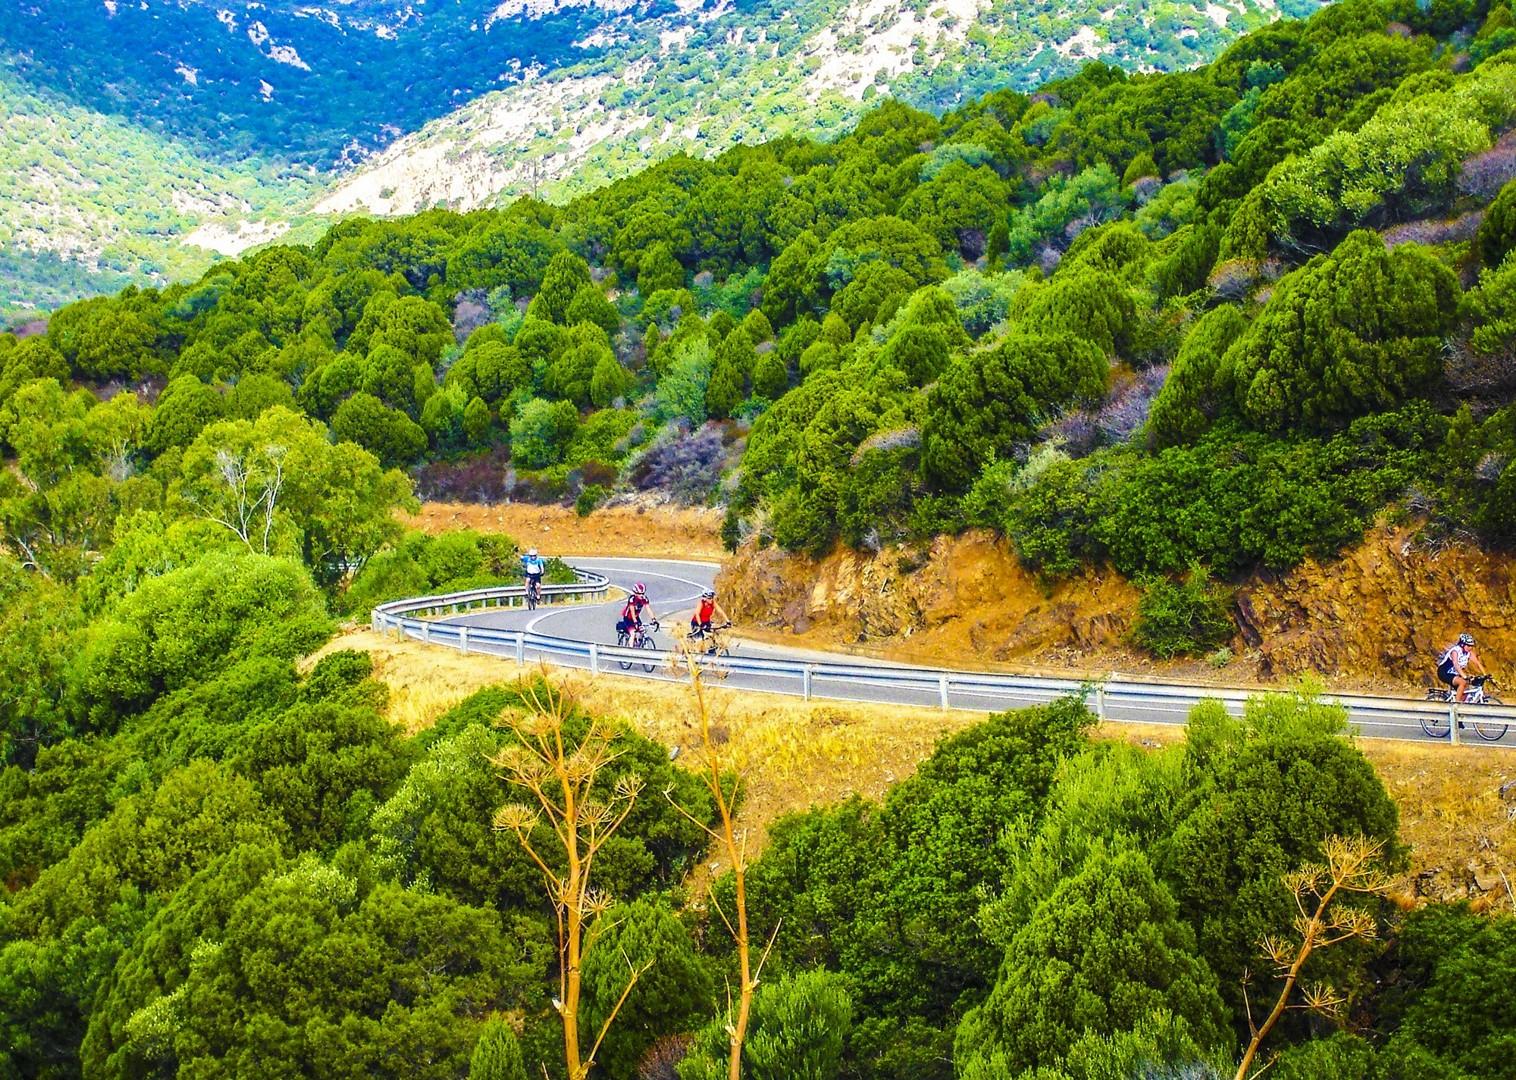 fdfsdfsdfsdfsdfsdf3.jpg - Italy - Sardinia - Island Flavours - Guided Leisure Cycling Holiday - Leisure Cycling